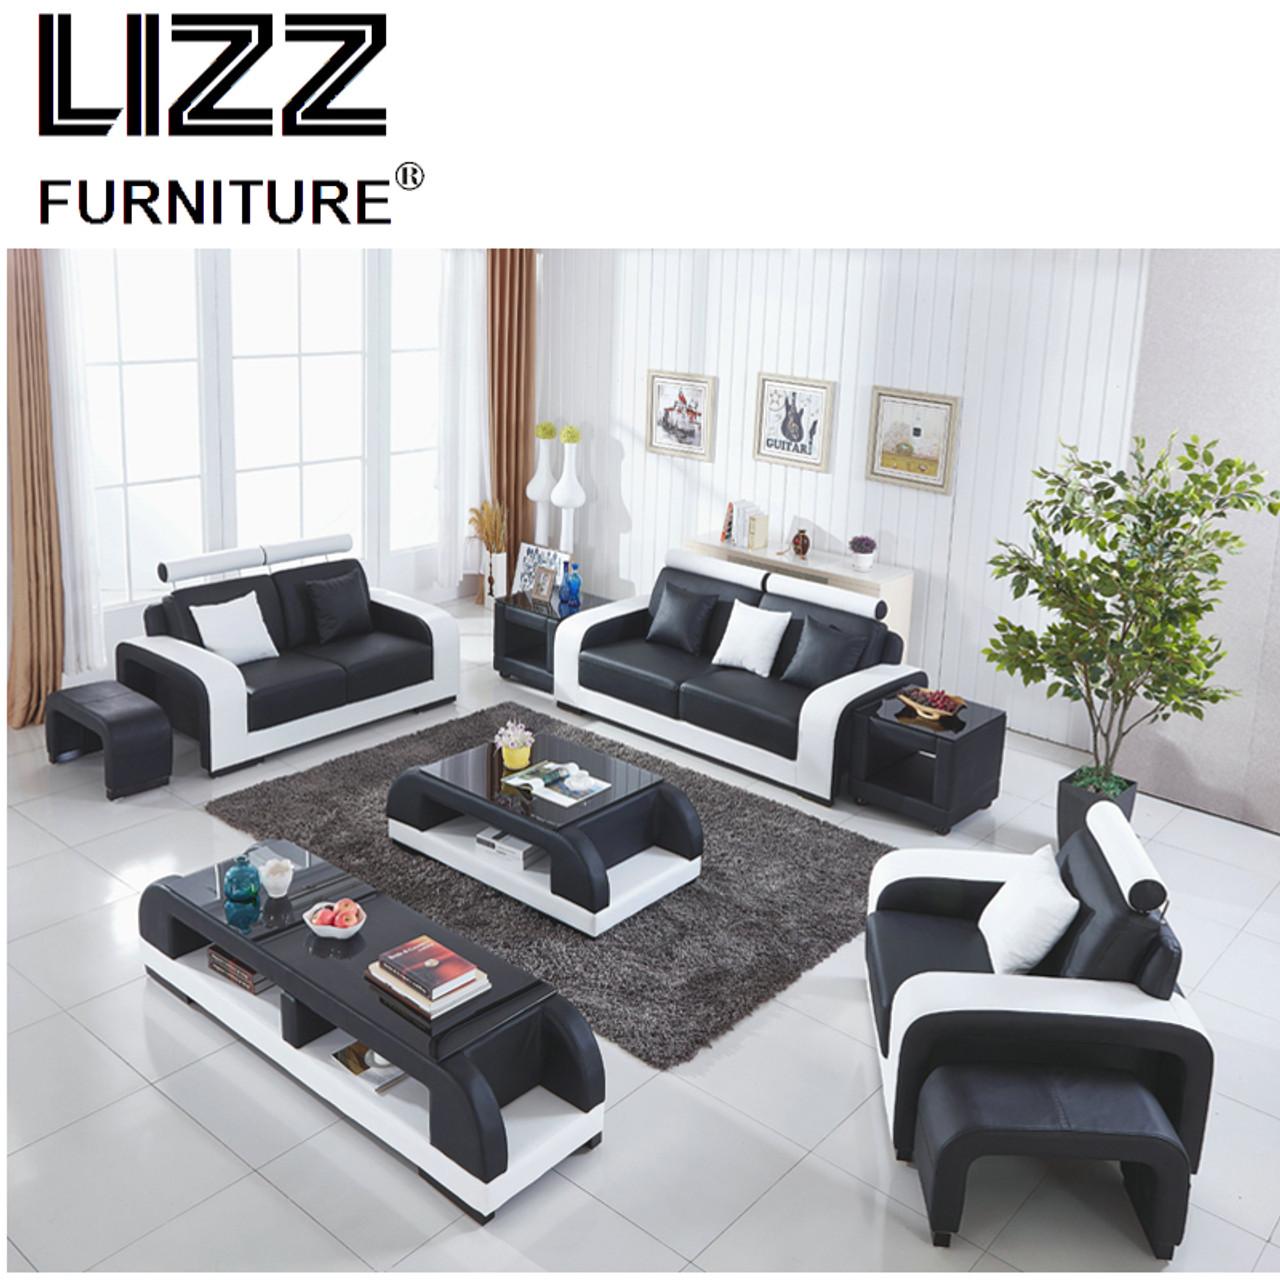 Adjustable headrest Italian leather seational sofa bean ...